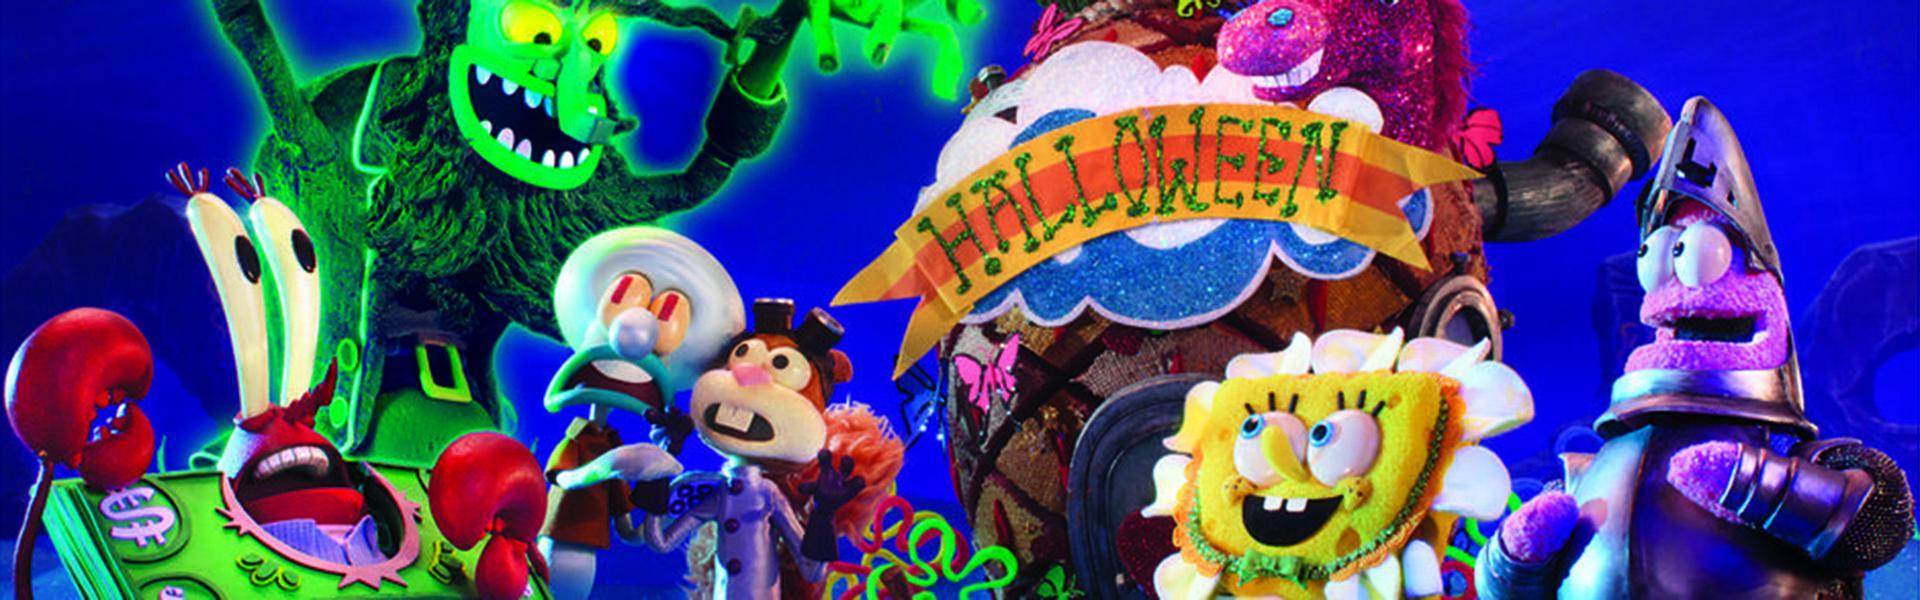 SpongeBob' Gets Spooky with Stop-Motion Halloween Special ...